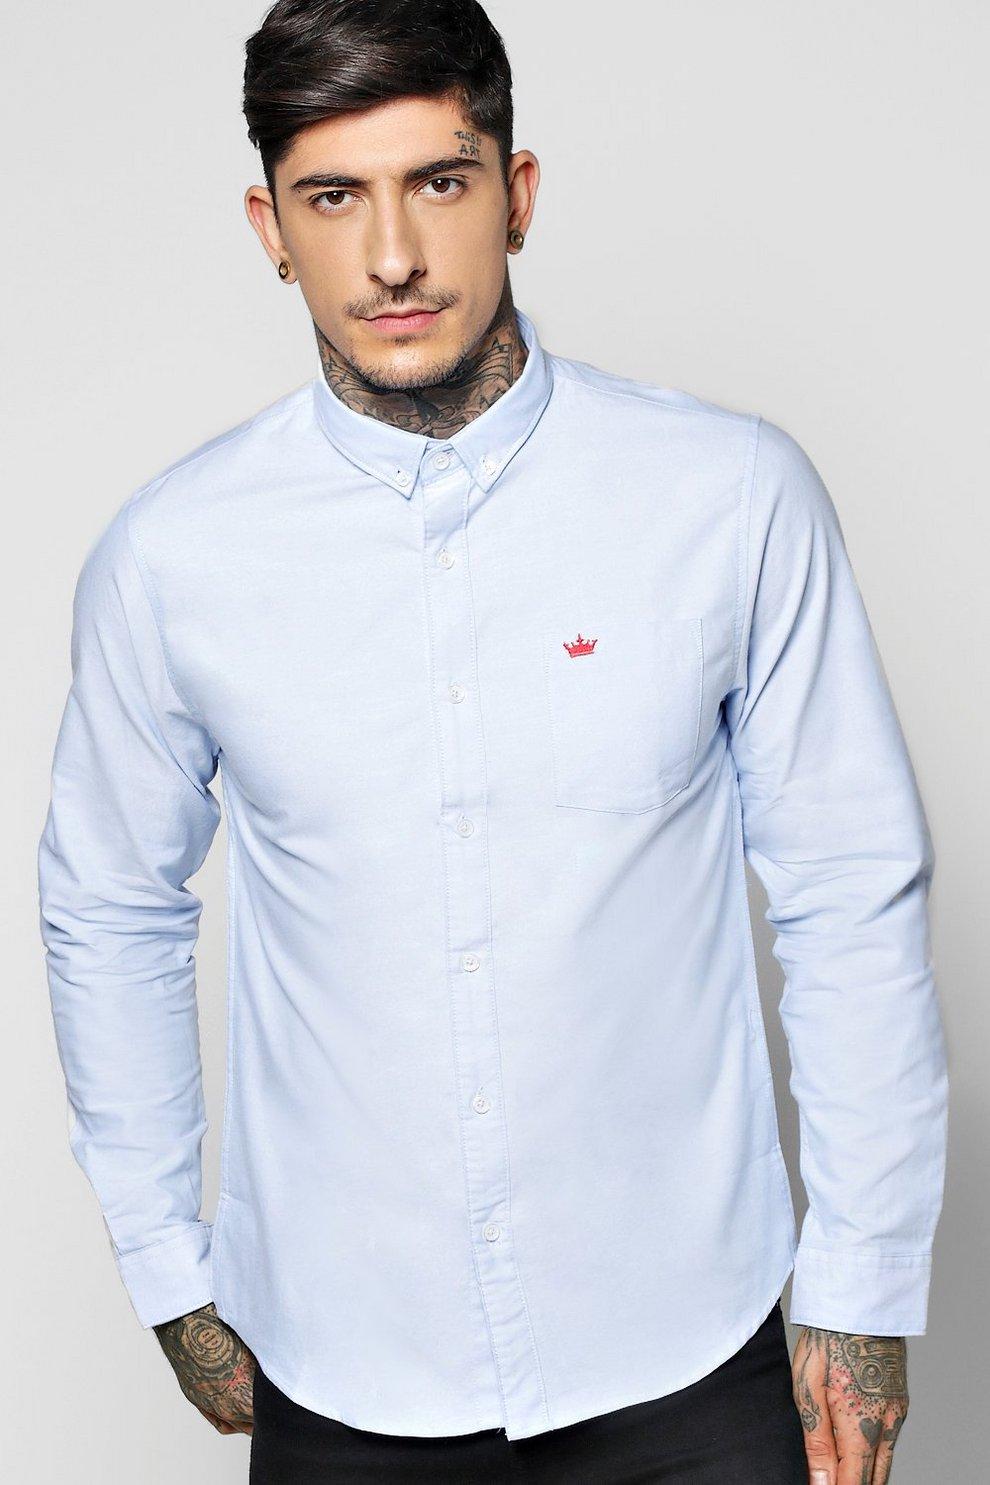 a8b8446f167 Long Sleeve Oxford Shirt   Boohoo